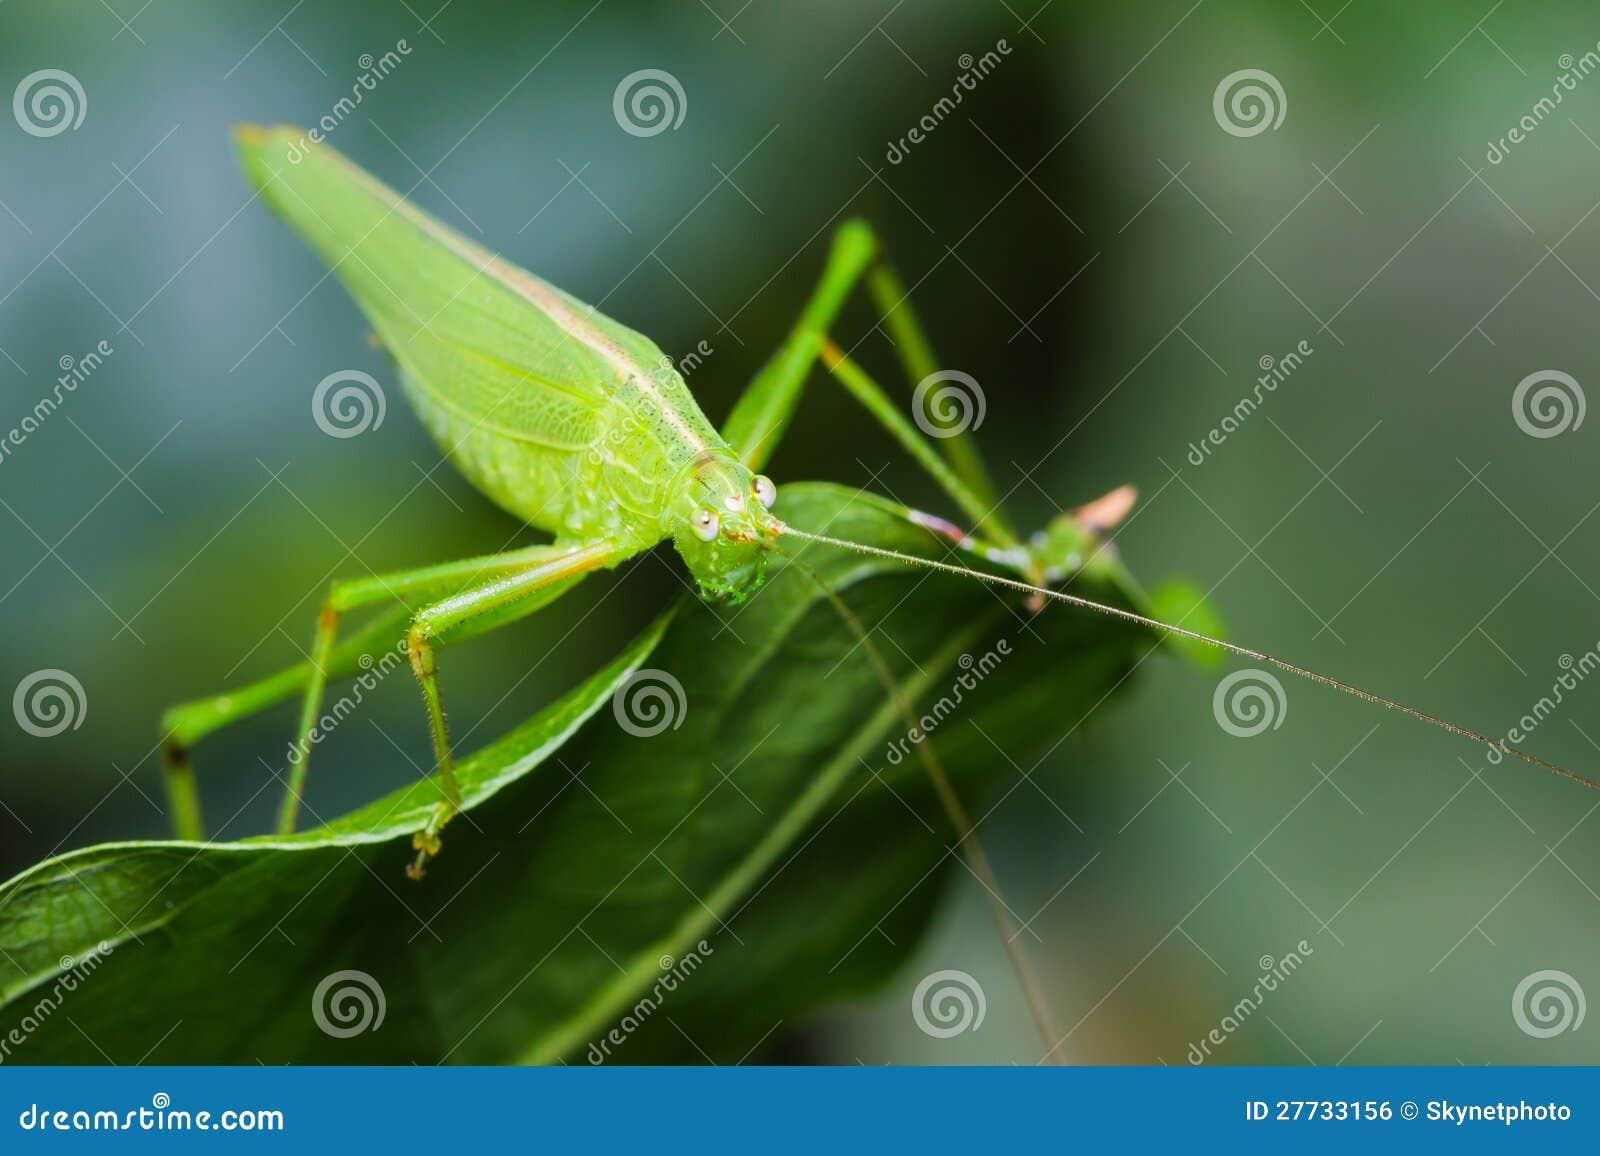 Großes grünes bushcricket